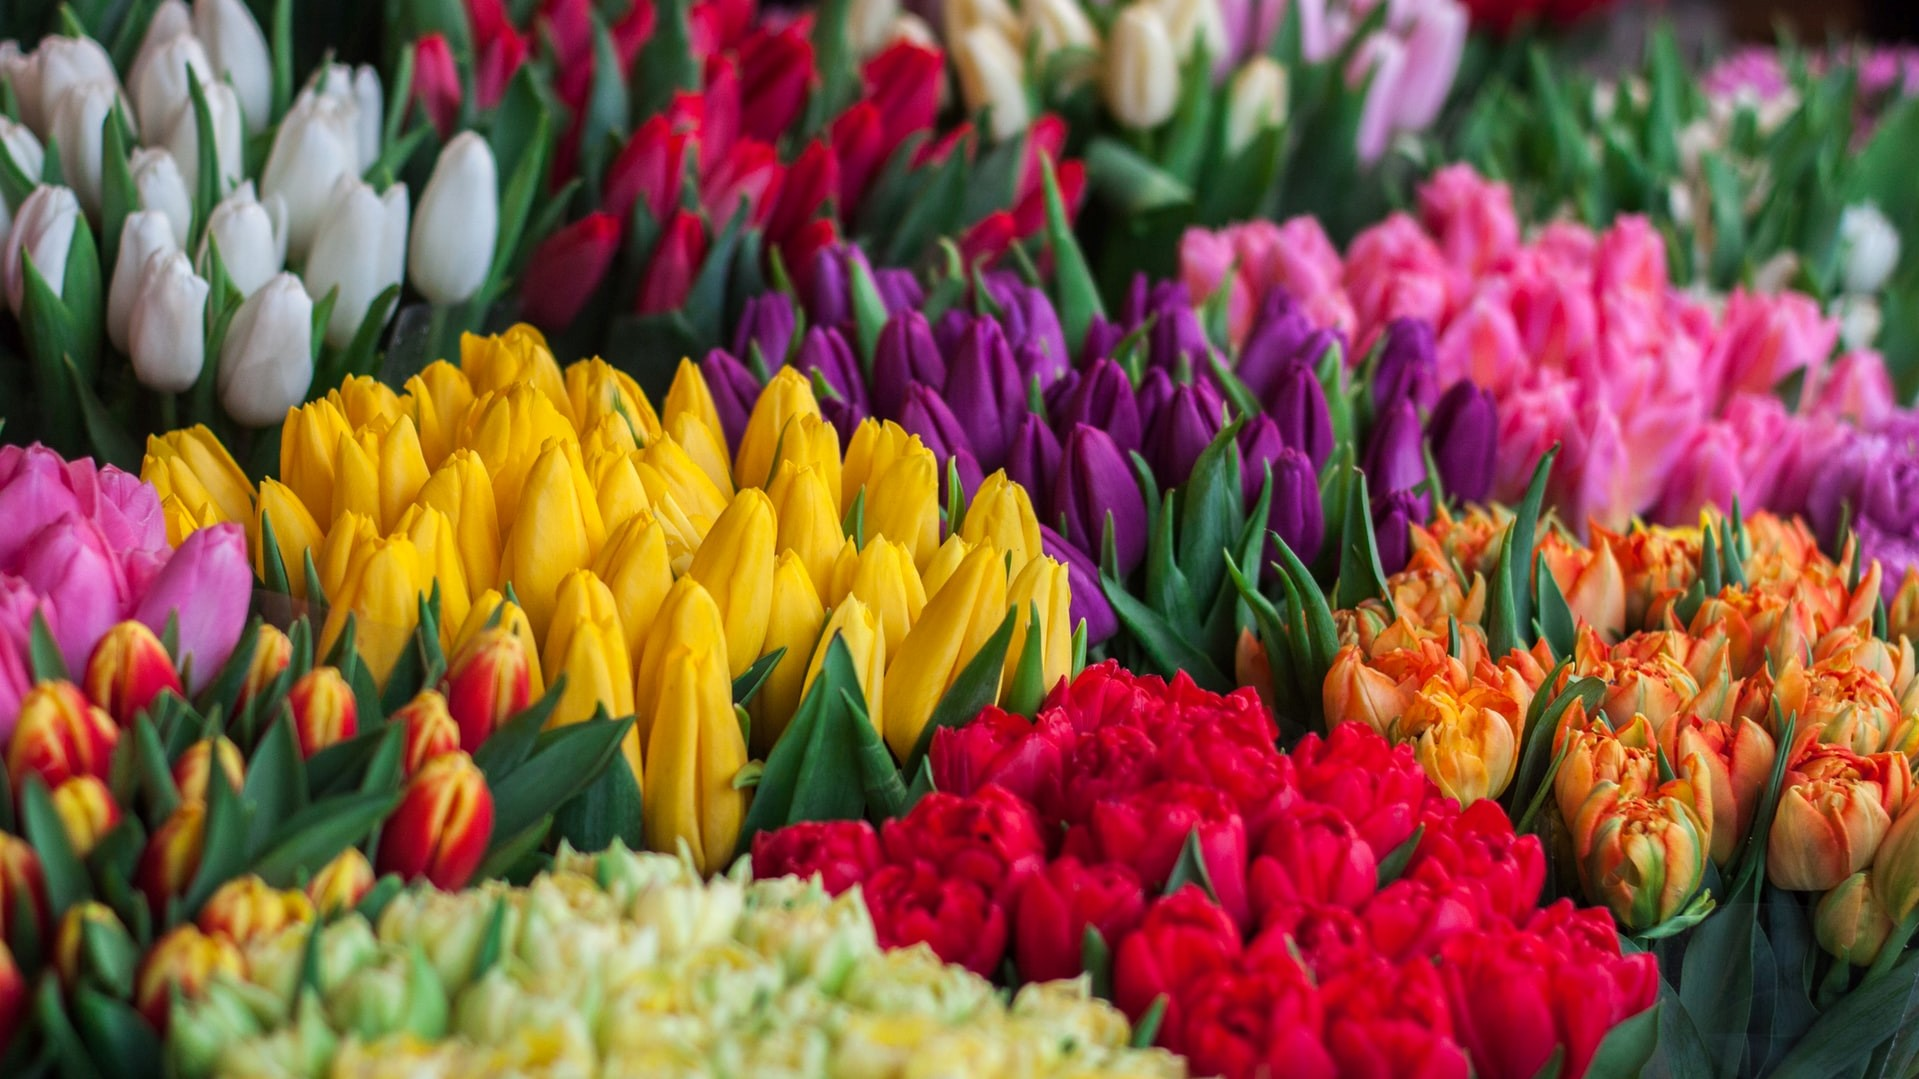 200 Million Flowers Update